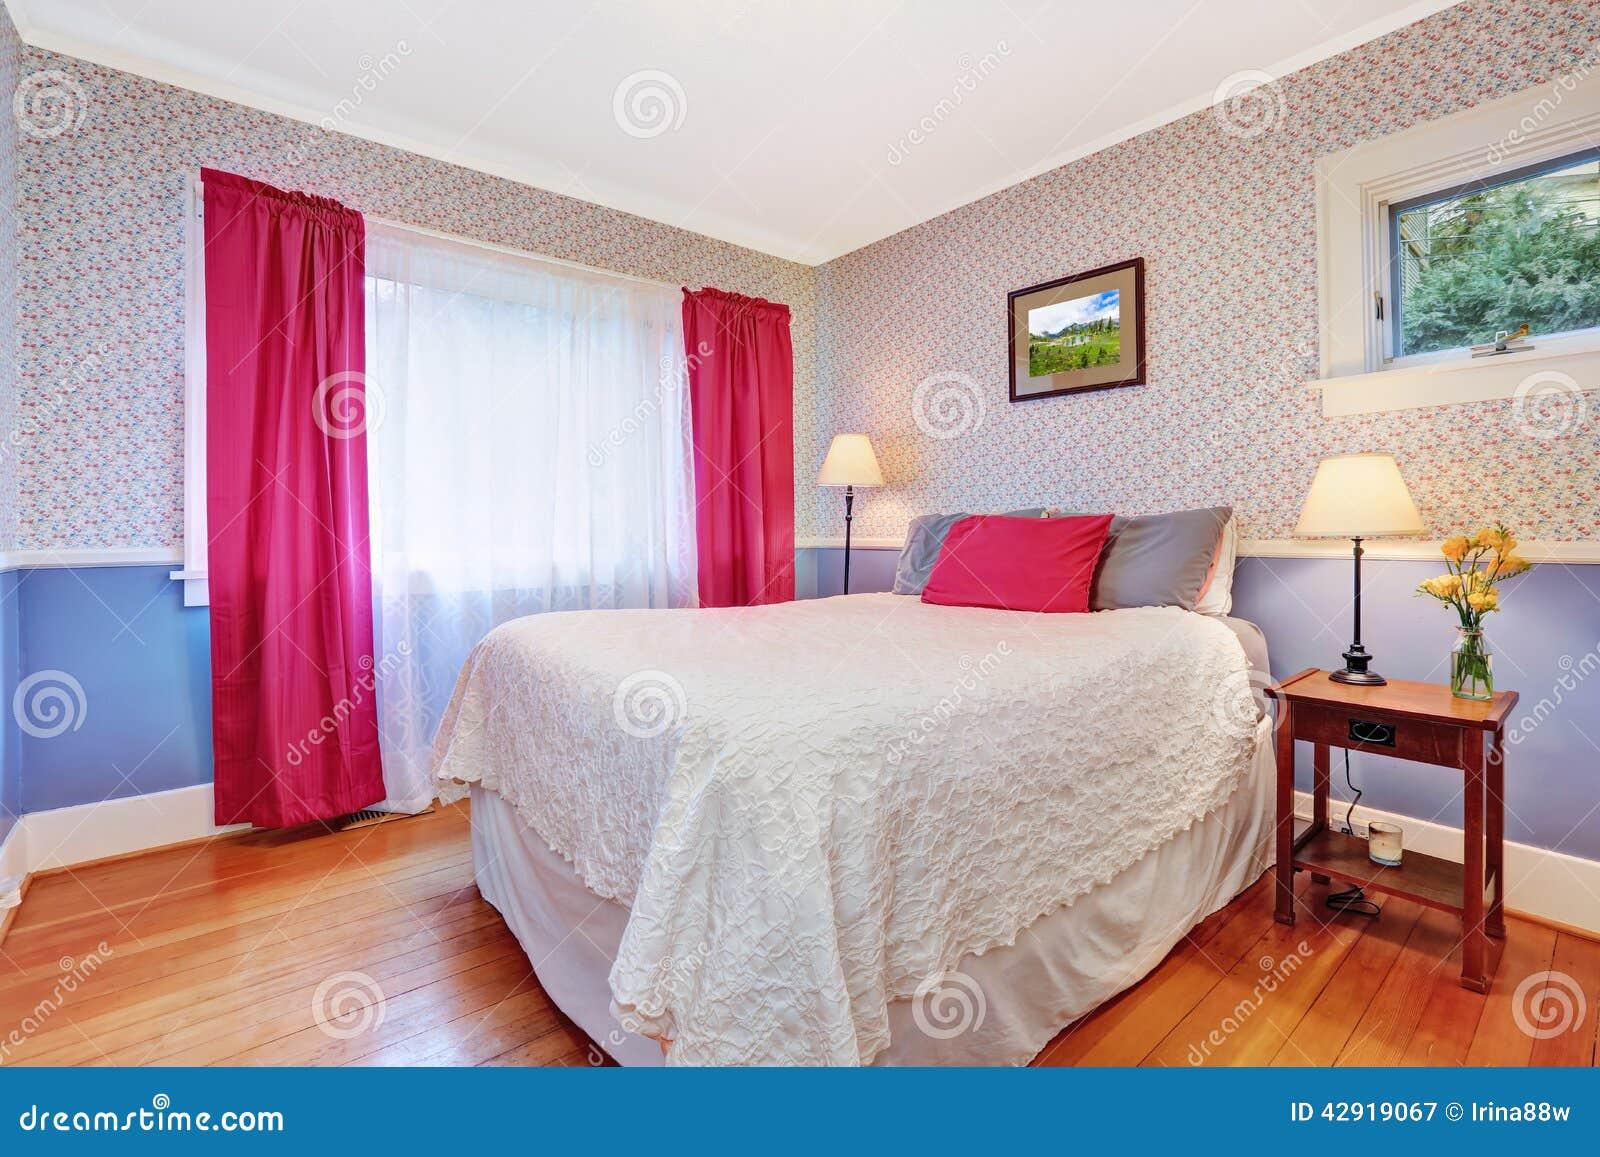 bright colorful bedroom interior stock photo image 42919067